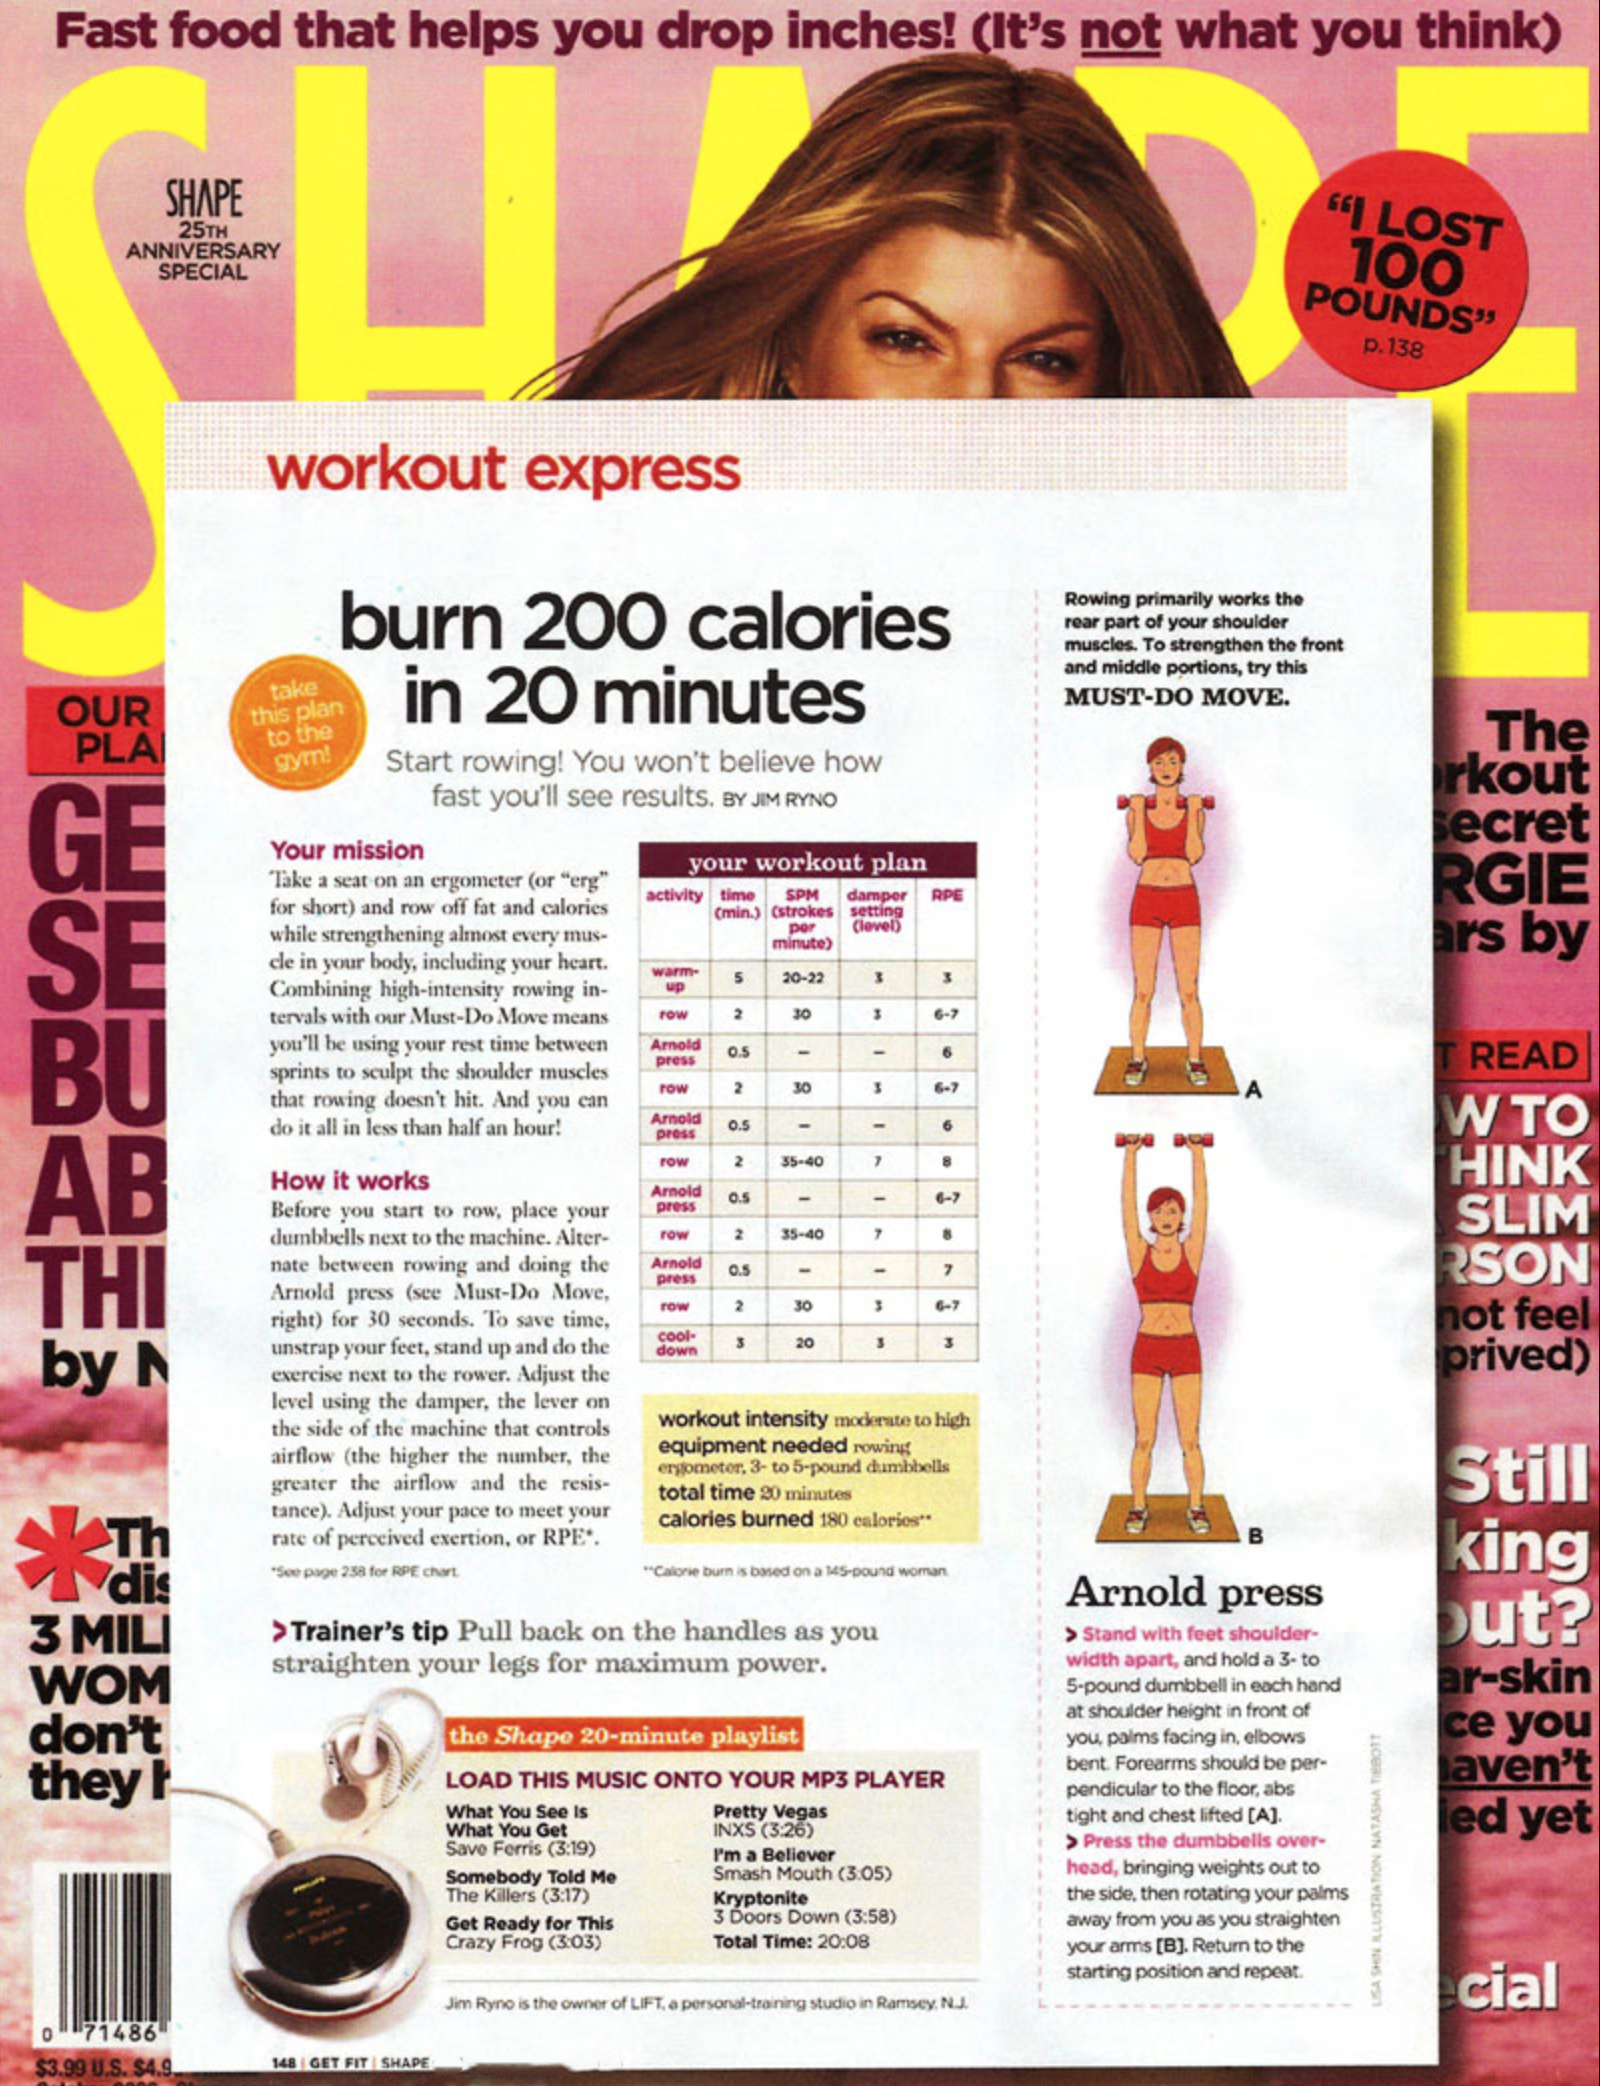 Jim Ryno Shape Magazine Burn 200 Calories in 20 Minutes.jpg